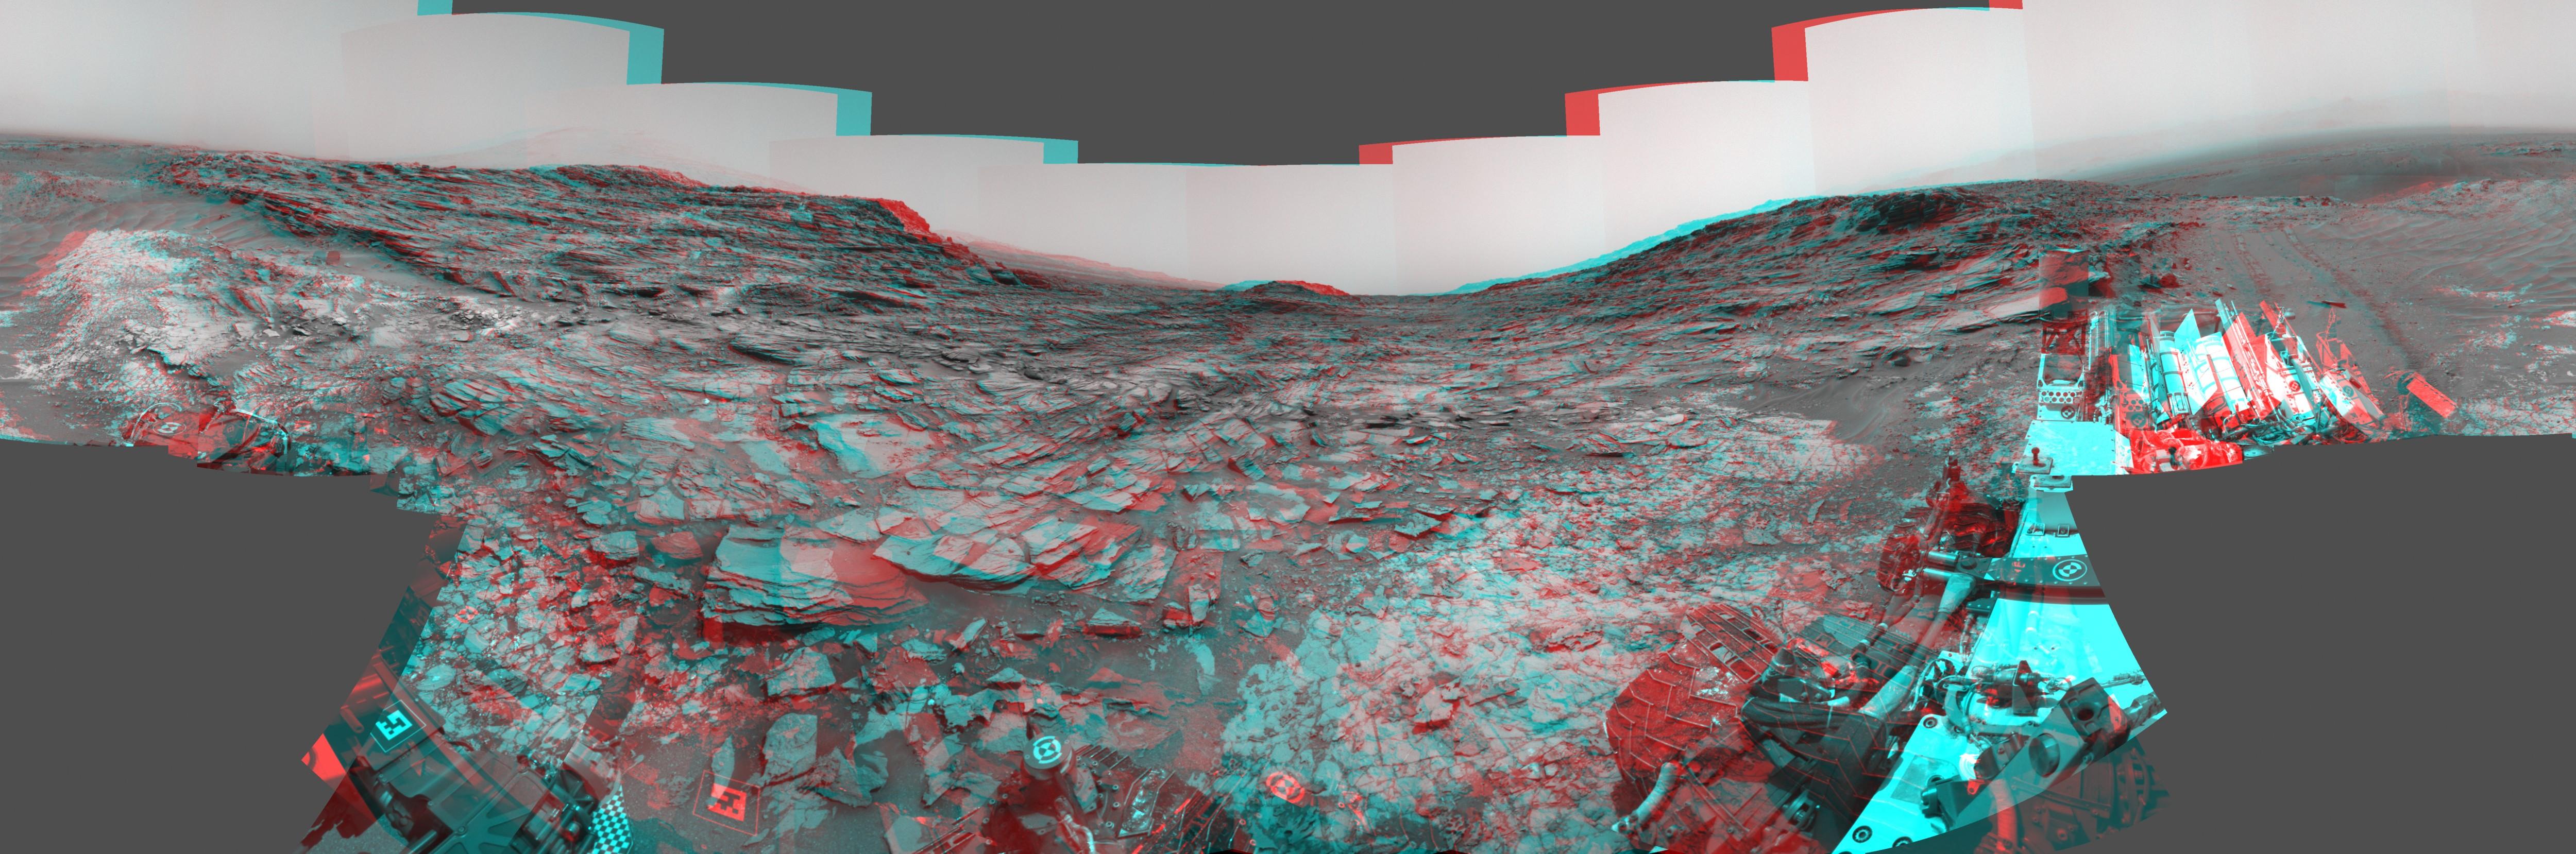 mars-curiosity-rover-msl-navcam-pia19678-full r